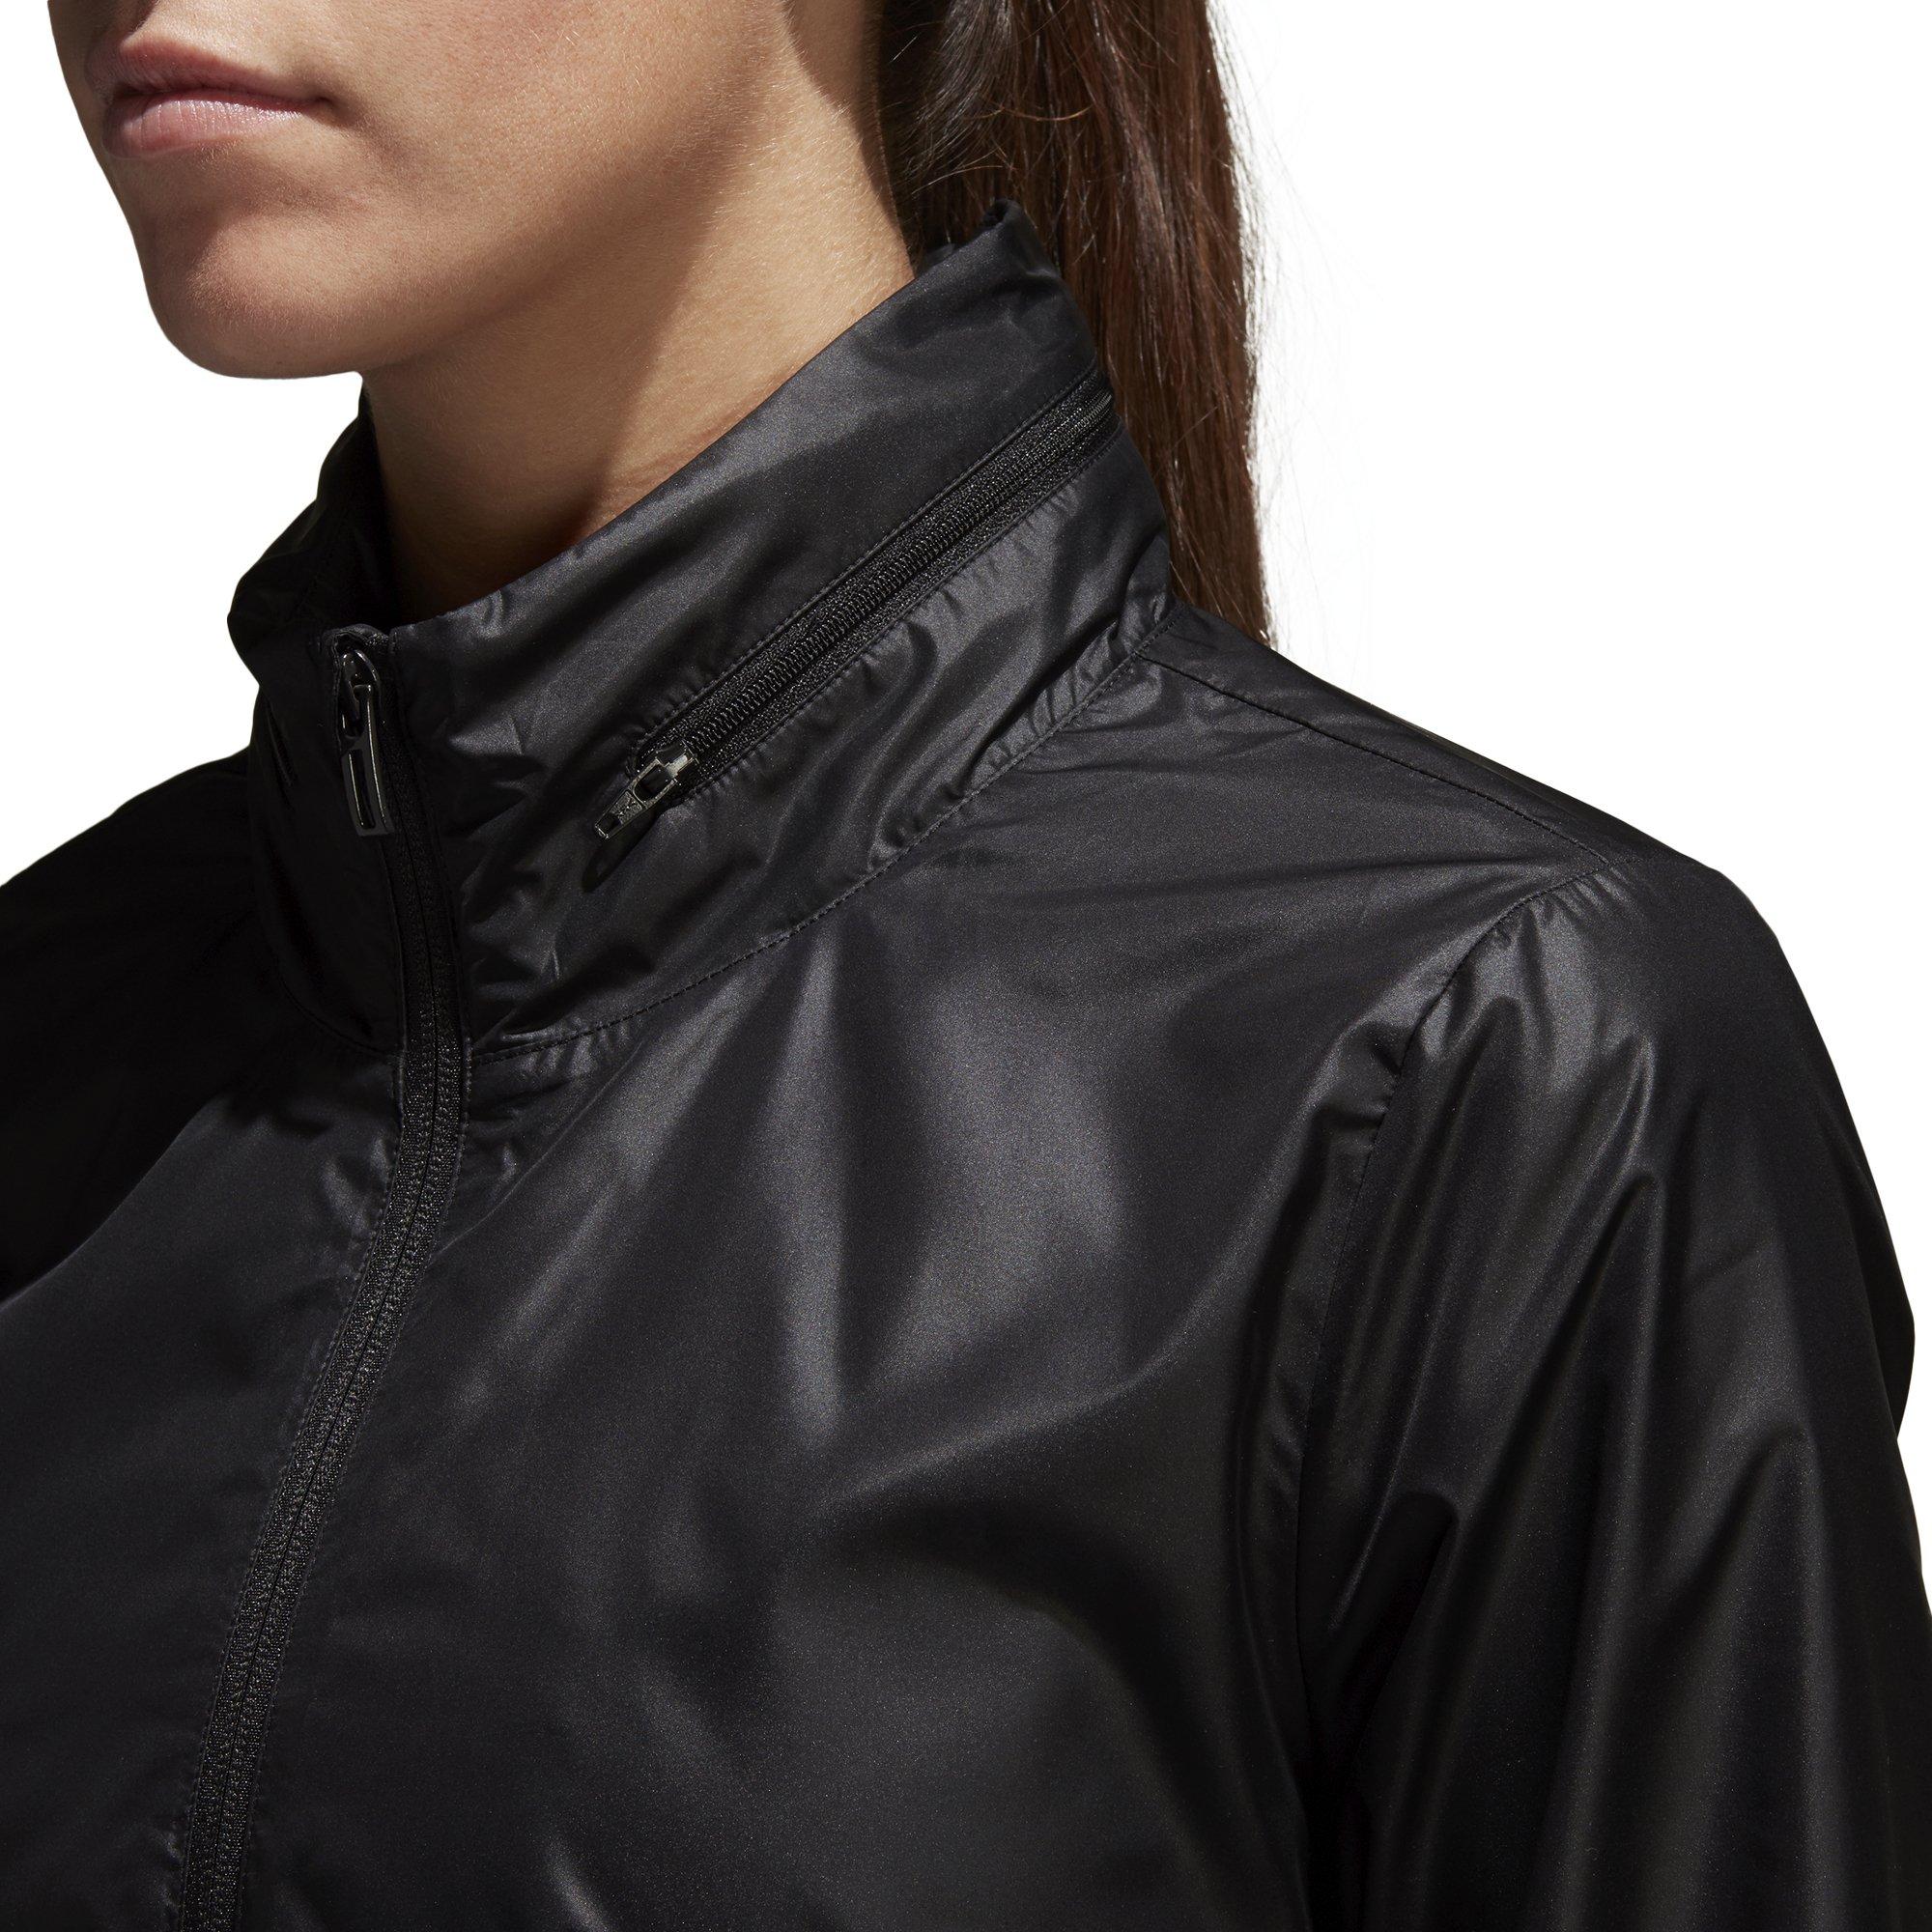 adidas Women's Linear Windbreaker Jacket, Black, Large by adidas (Image #8)